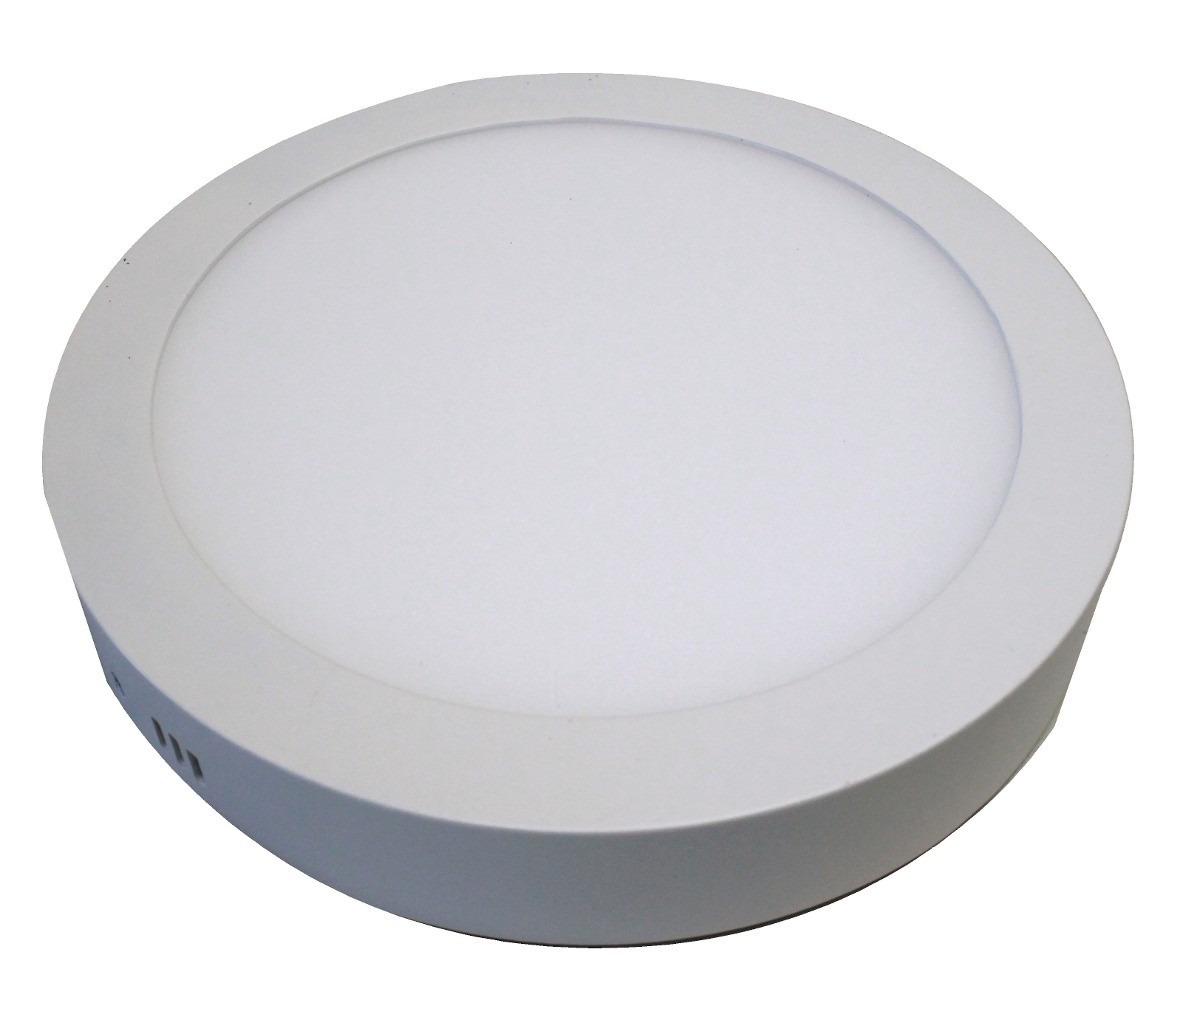 Painel Plafon Redondo Luminária Sobrepor Led 24W Bivolt Branco Frio - RPC-COMMERCE